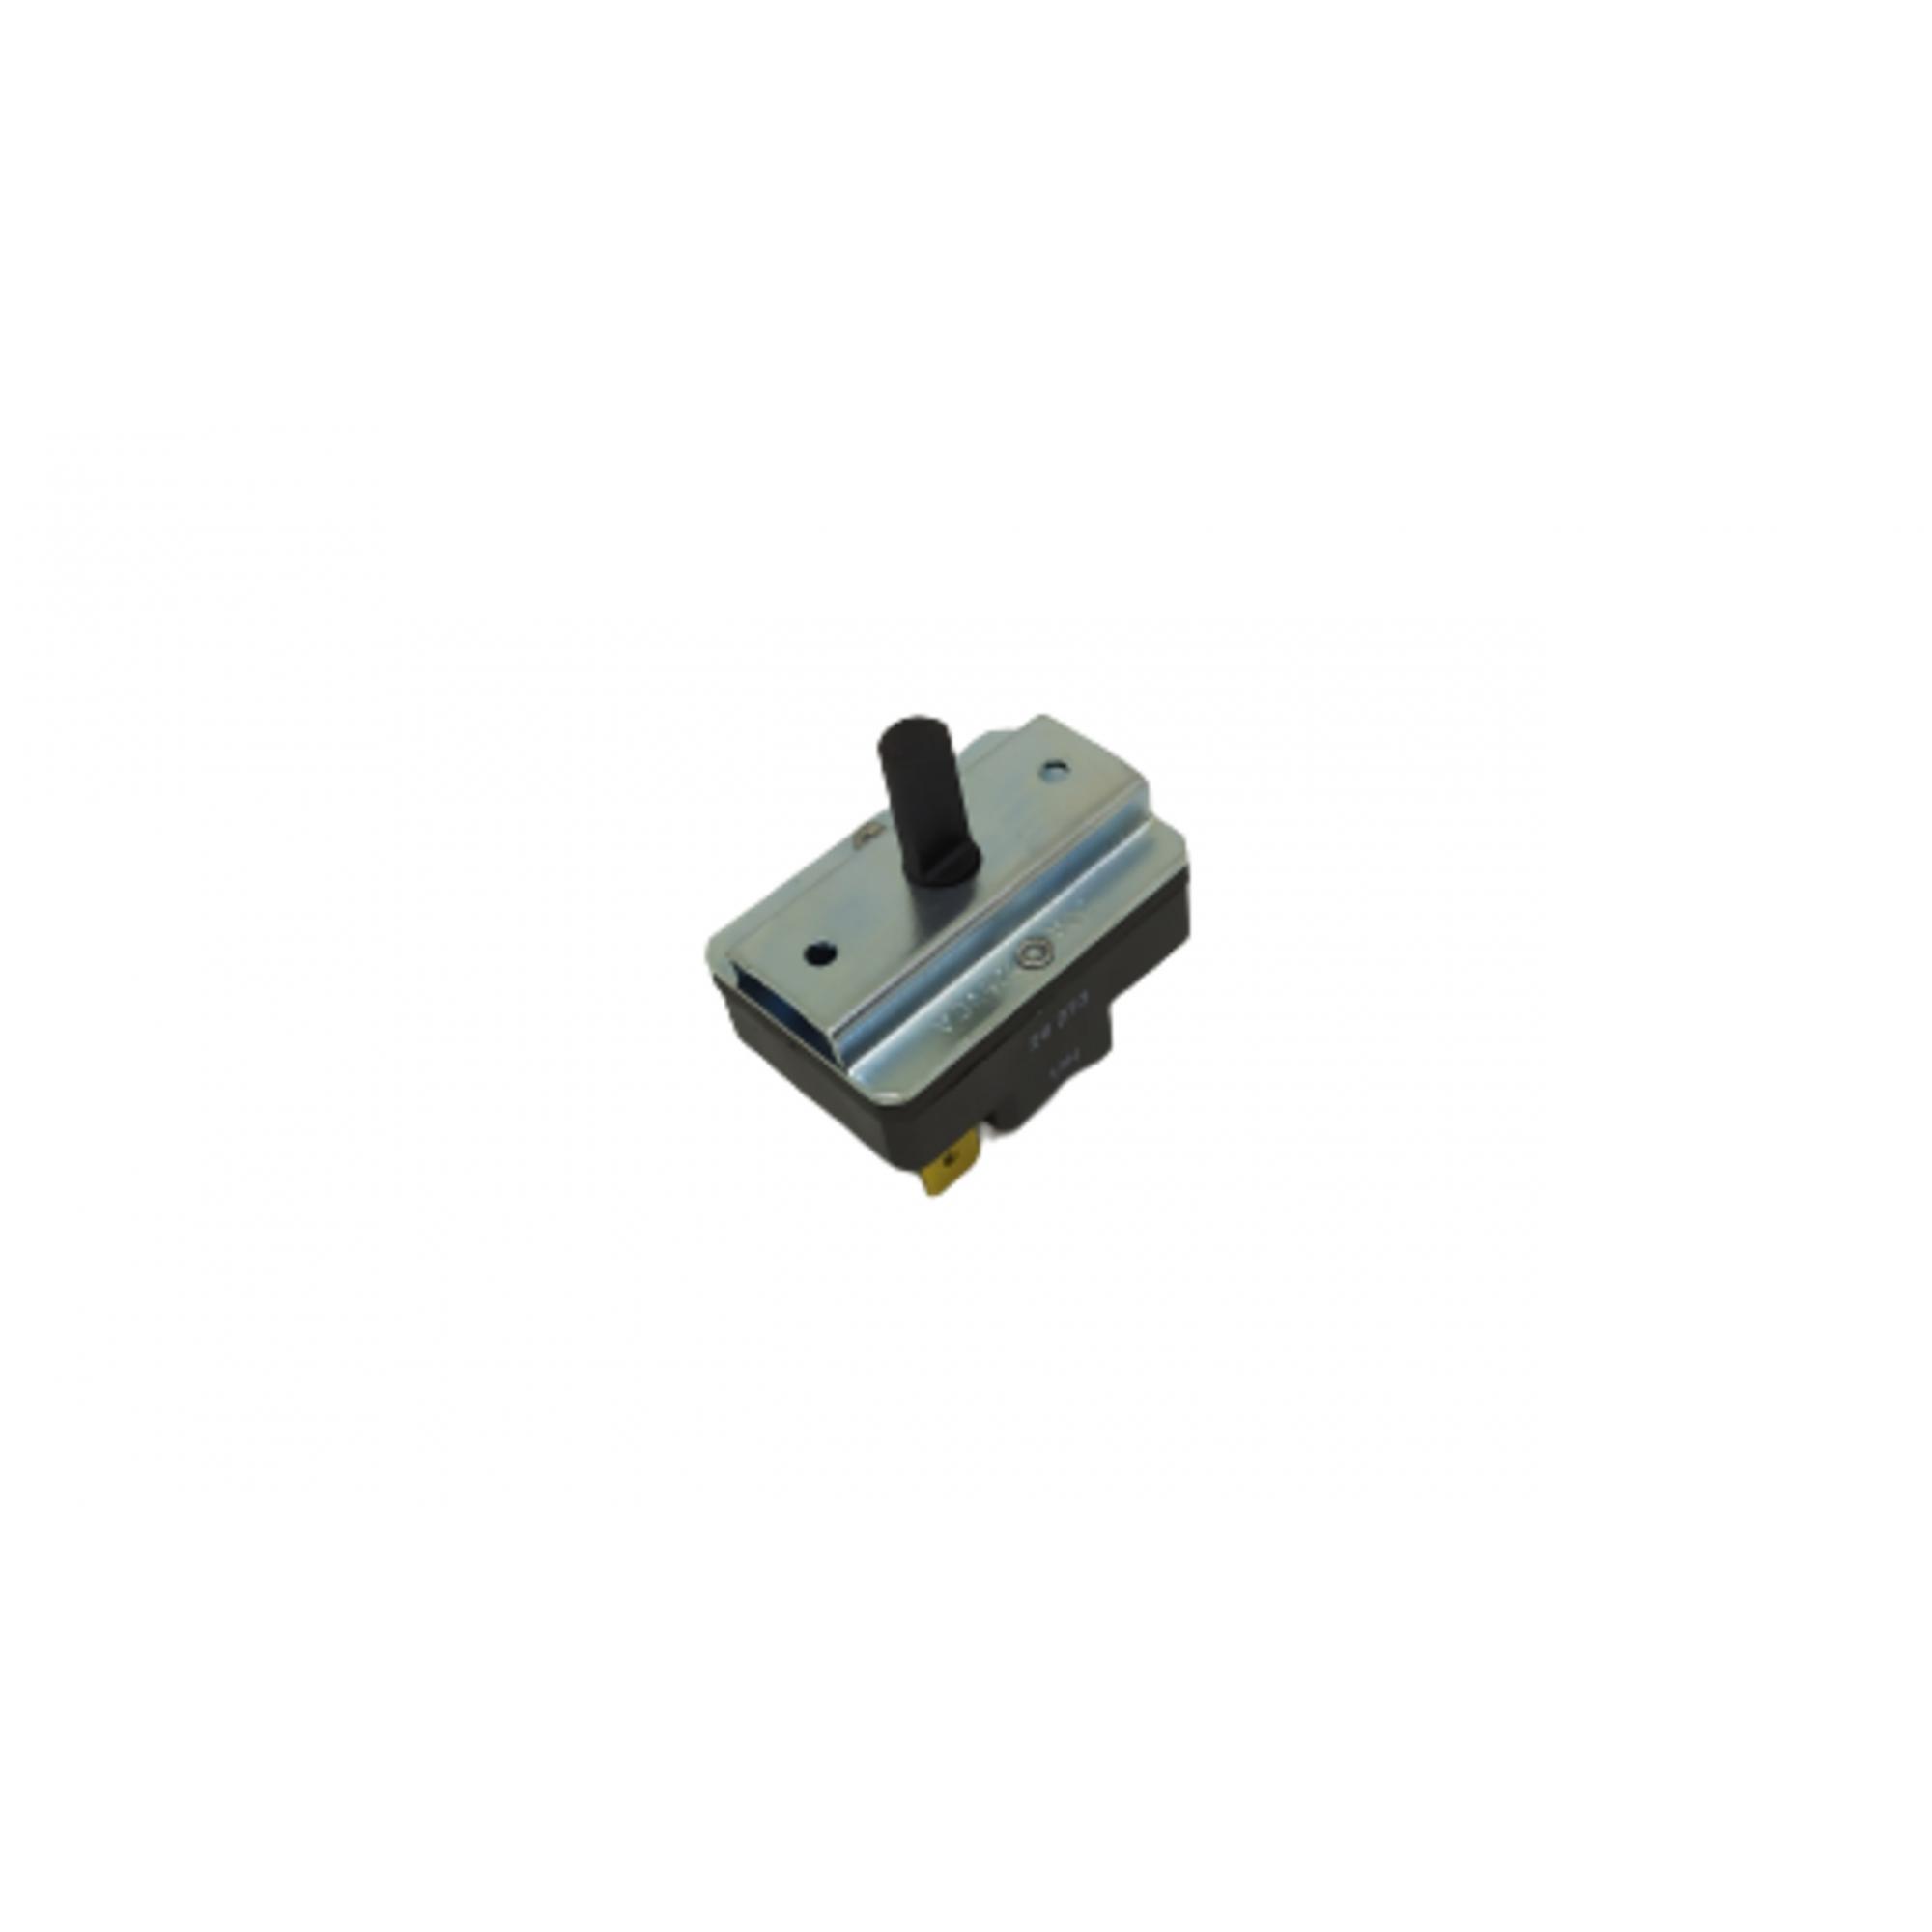 Interruptor Chave rotativa Forno Suggar